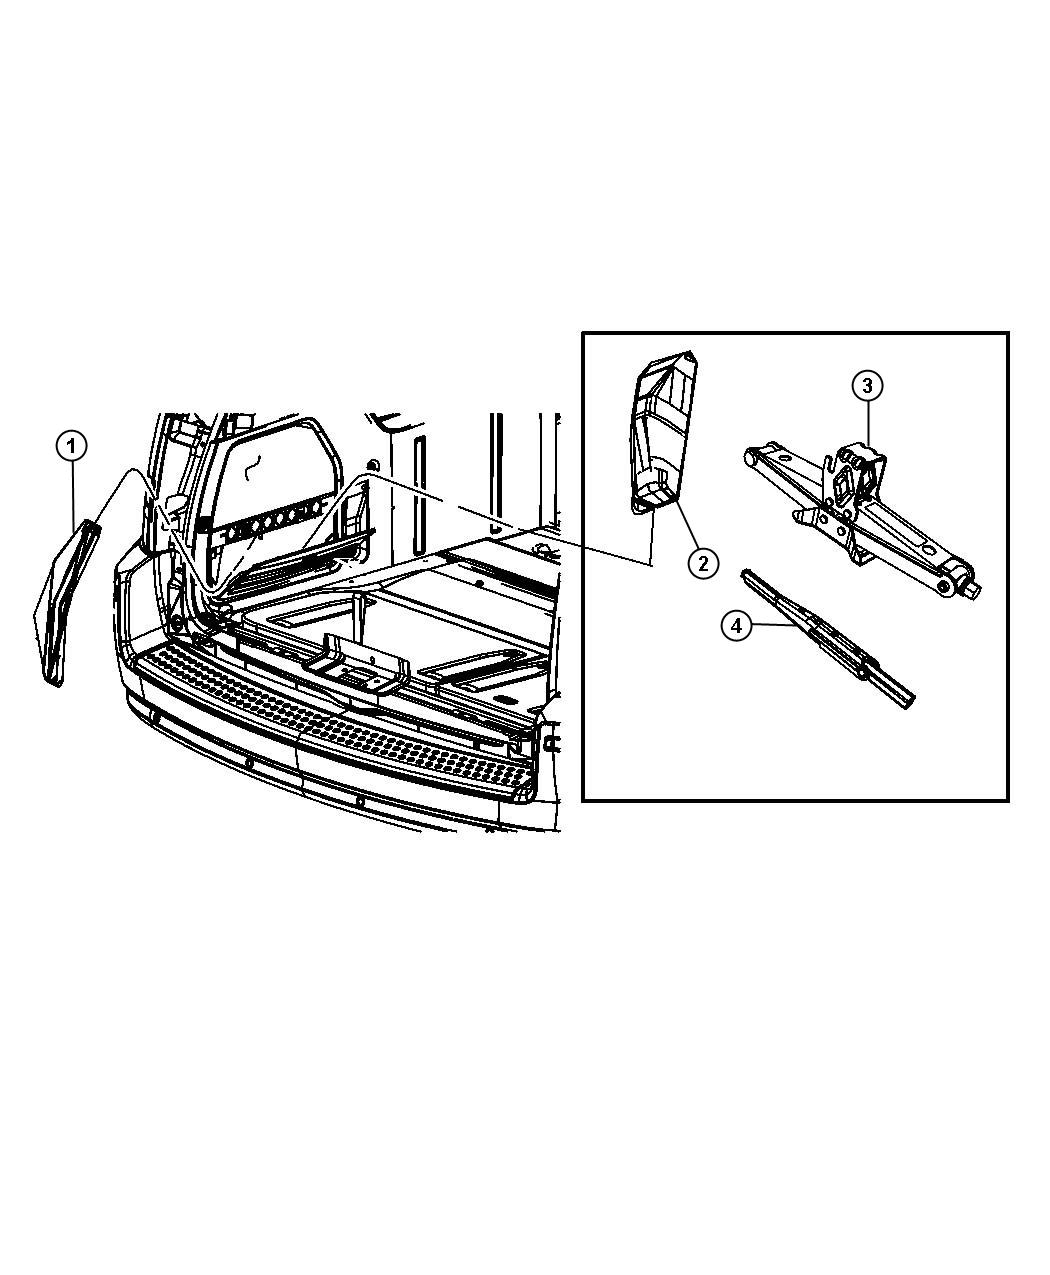 Dodge Grand Caravan Jack Scissors Tbt Or Compact